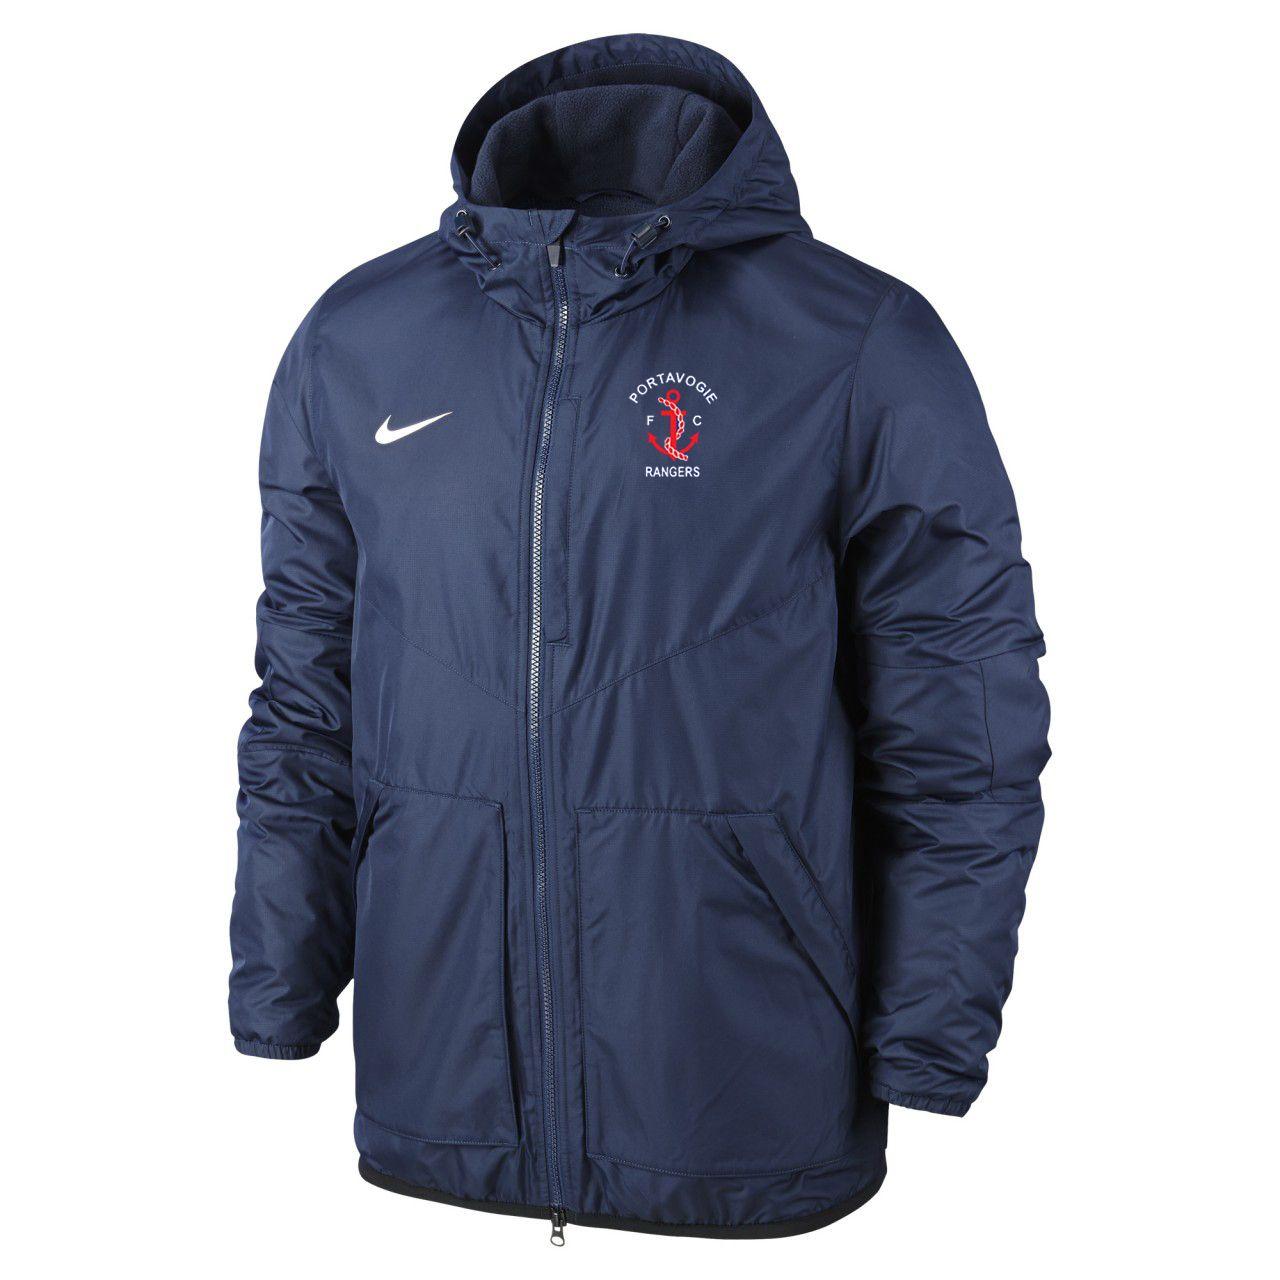 portavogie rangers fc navy fall jacket 8728 p